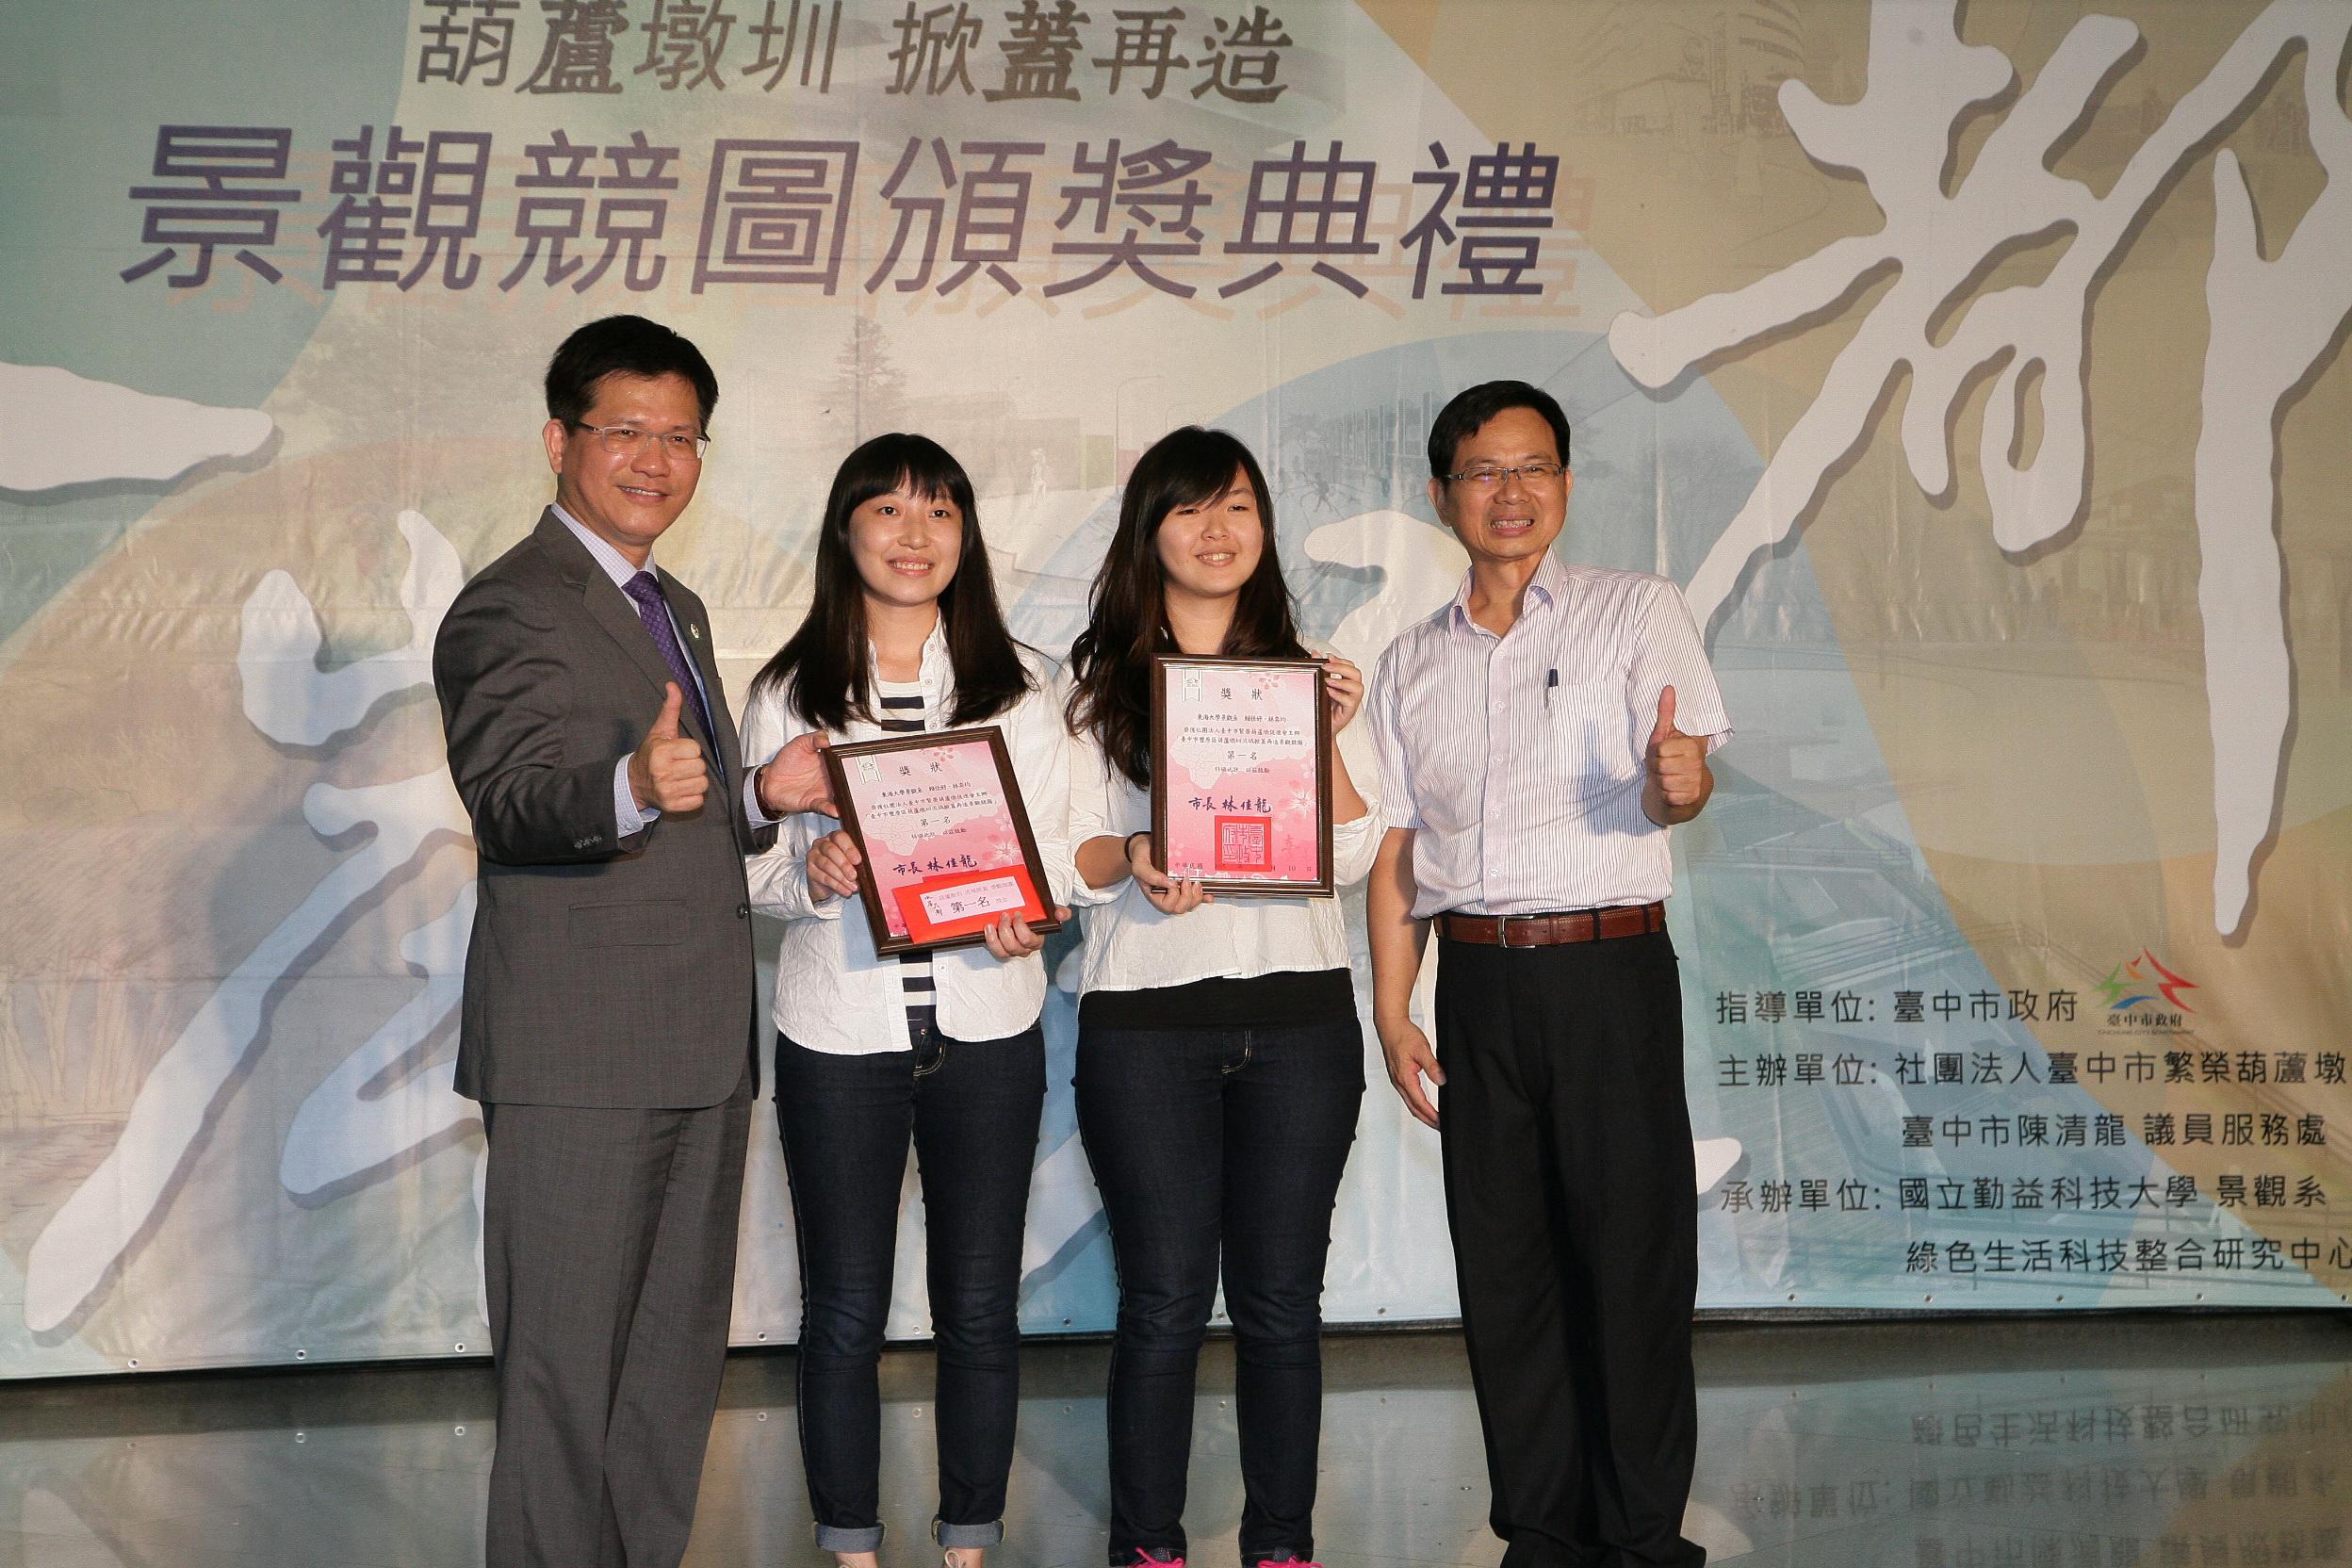 Students of Department of Landscape Architecture Won Frist Place in Landscape Design Competitio